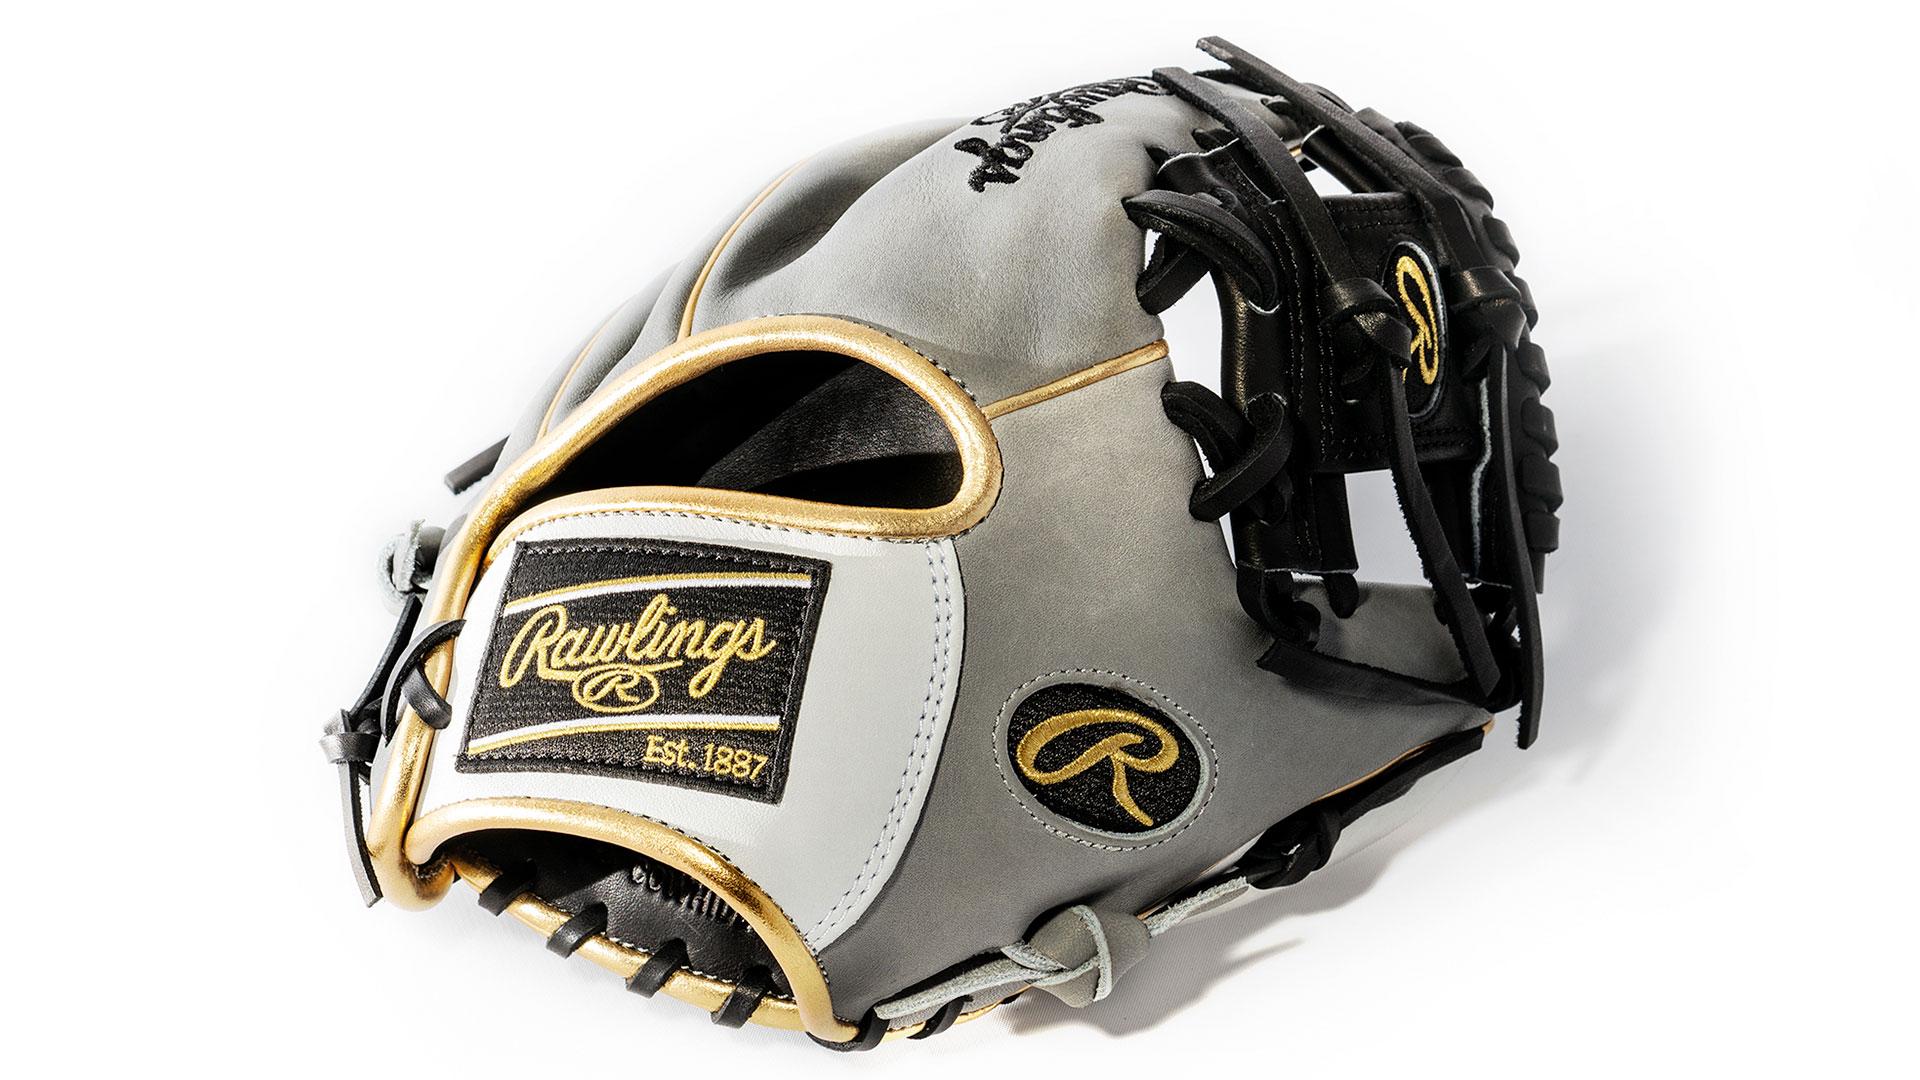 ae6bdfc2 Custom Gloves for Baseball and Softball :: Rawlings.com